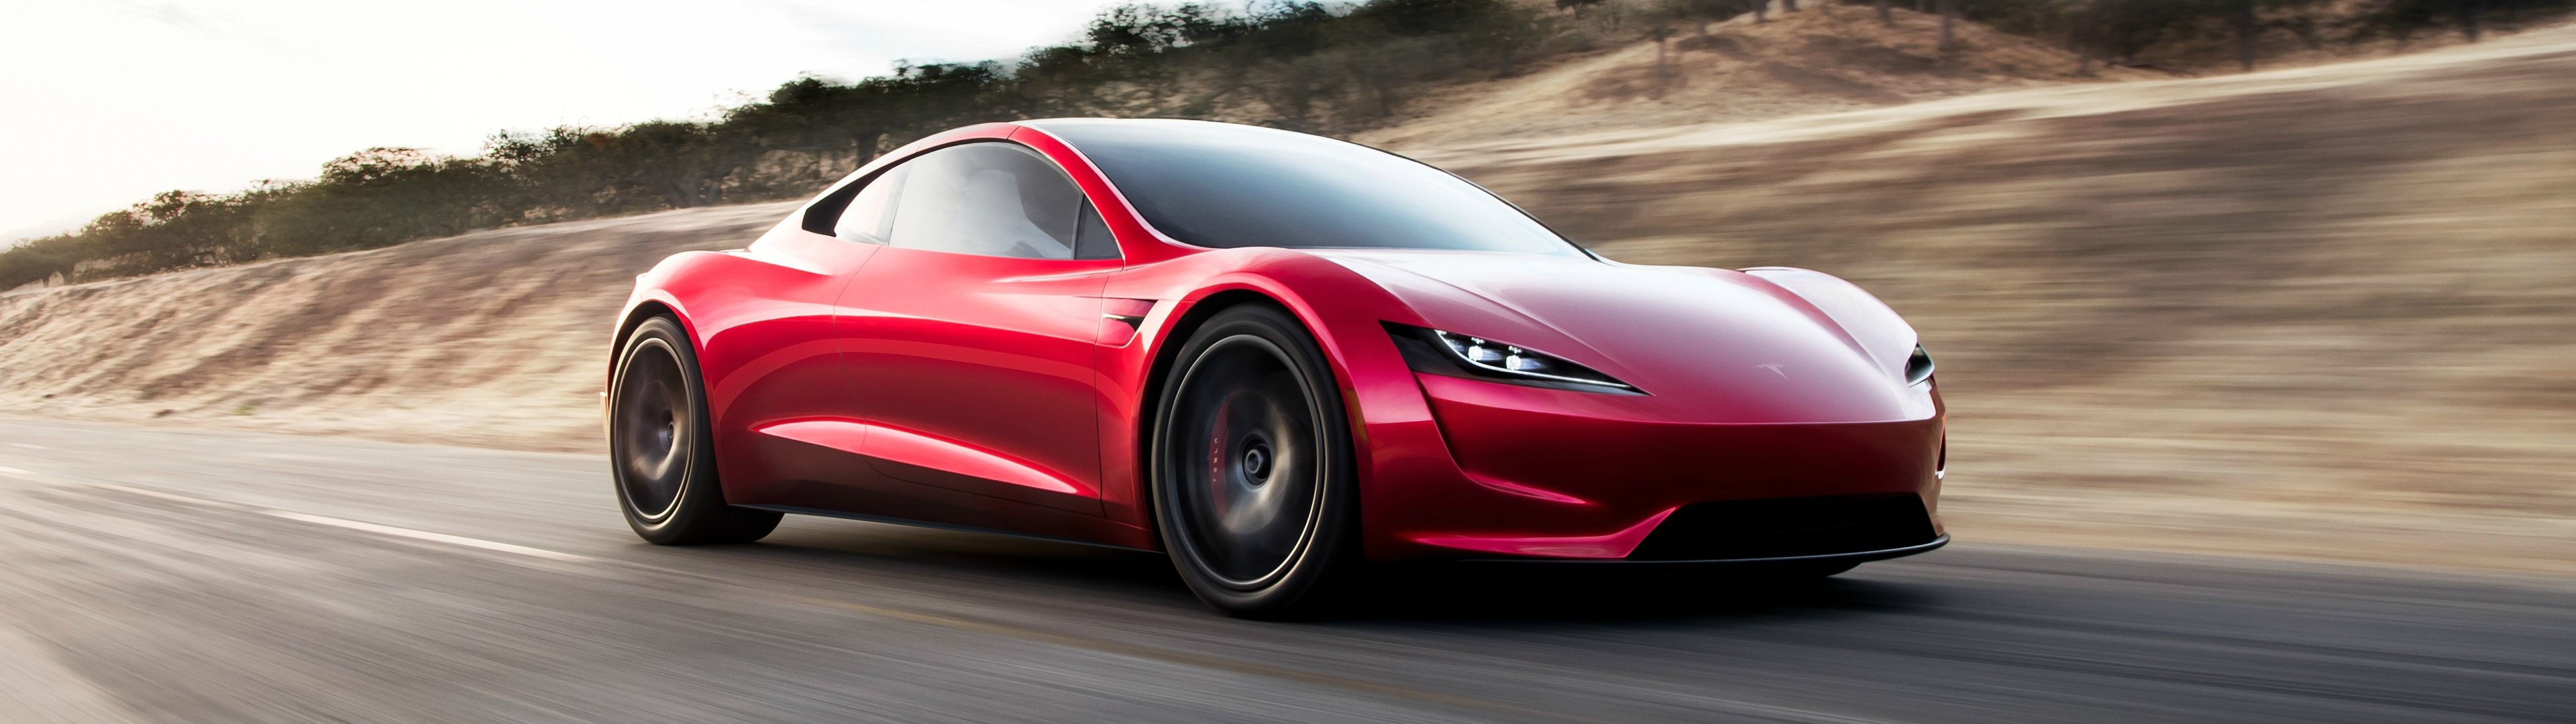 And it isn't always easy. 3840x1080 Tesla Roadster Multiwall